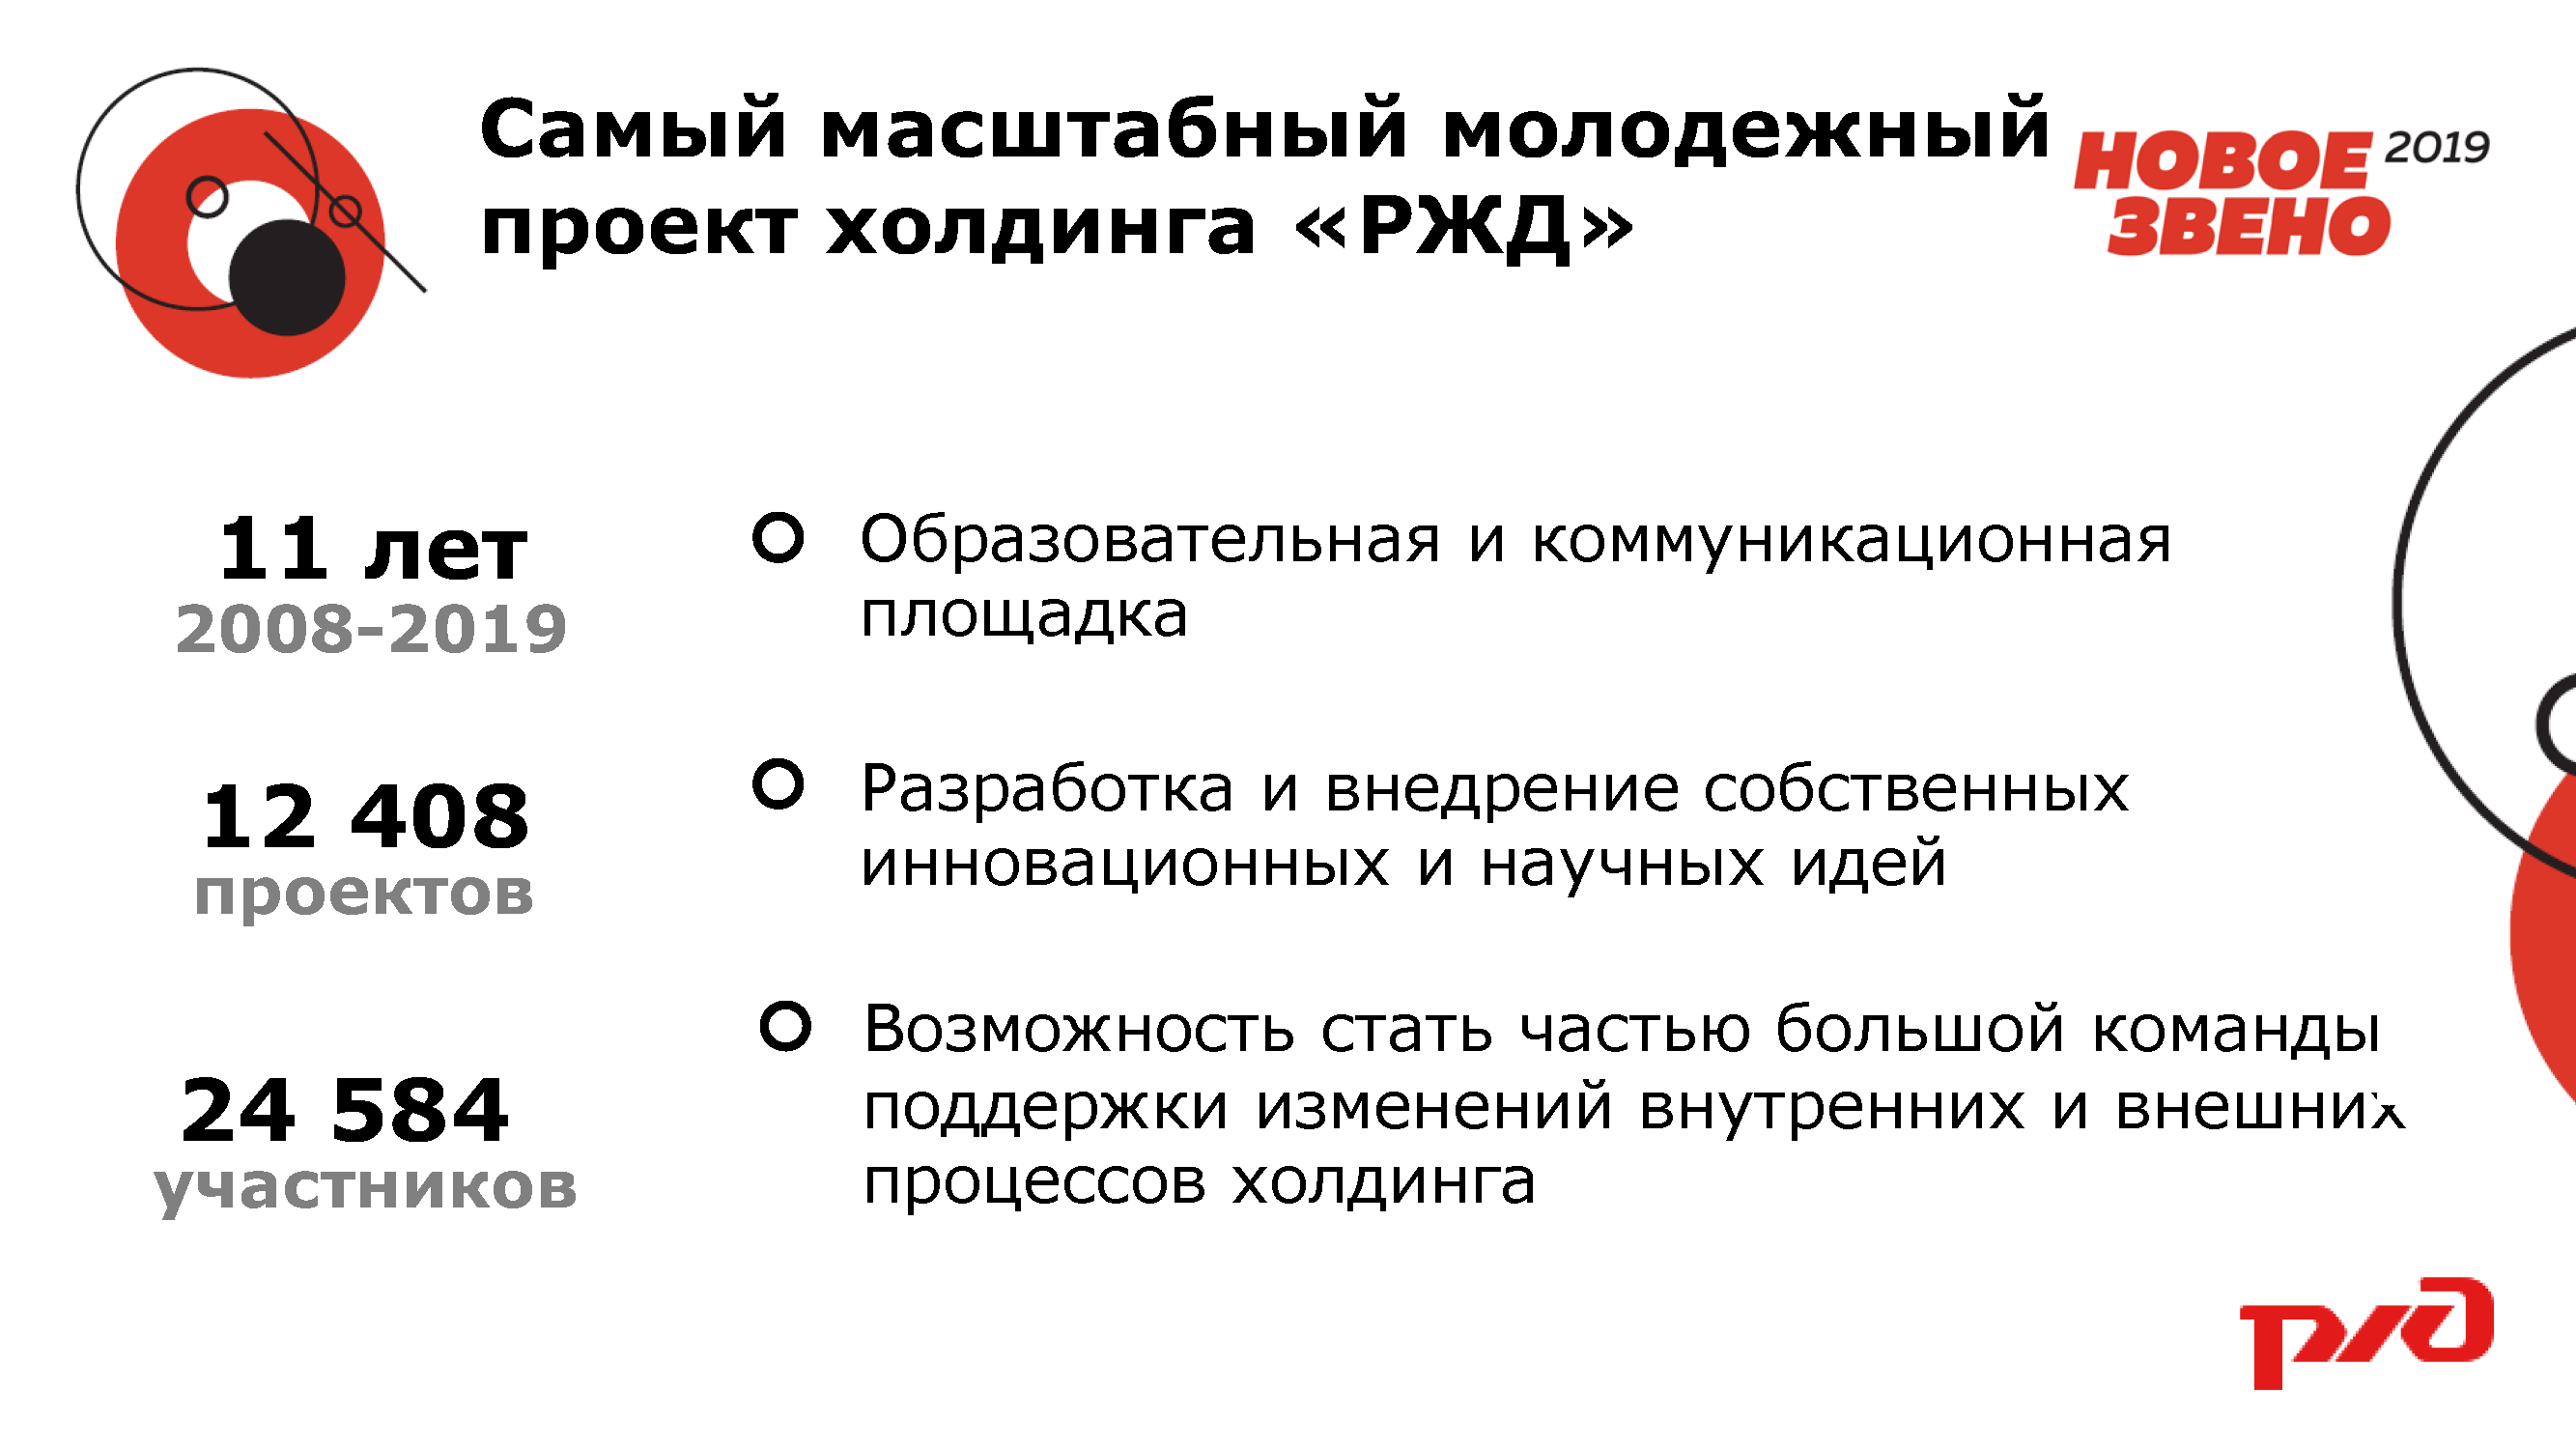 Общая презентация_Новое звено ИТОГ_Страница_2